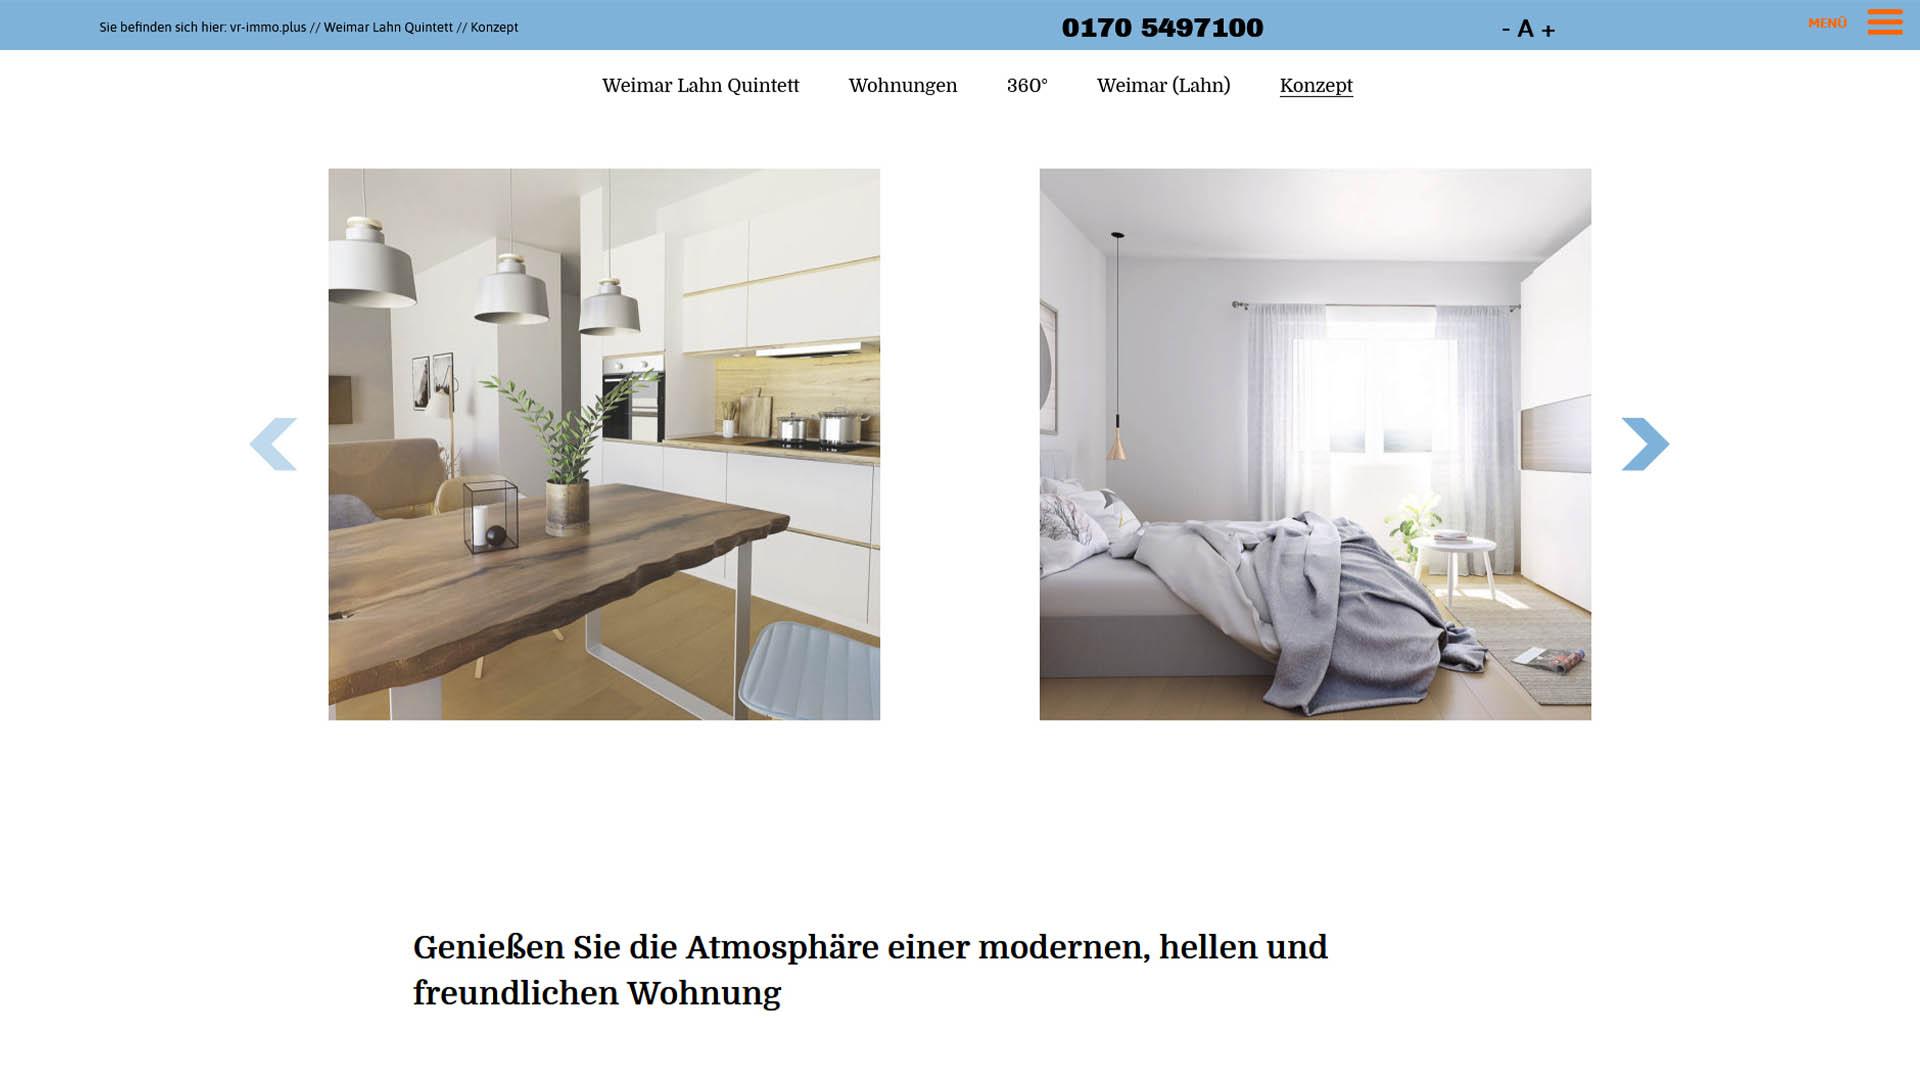 Immobilienmarketing vr-immoplus Webseite